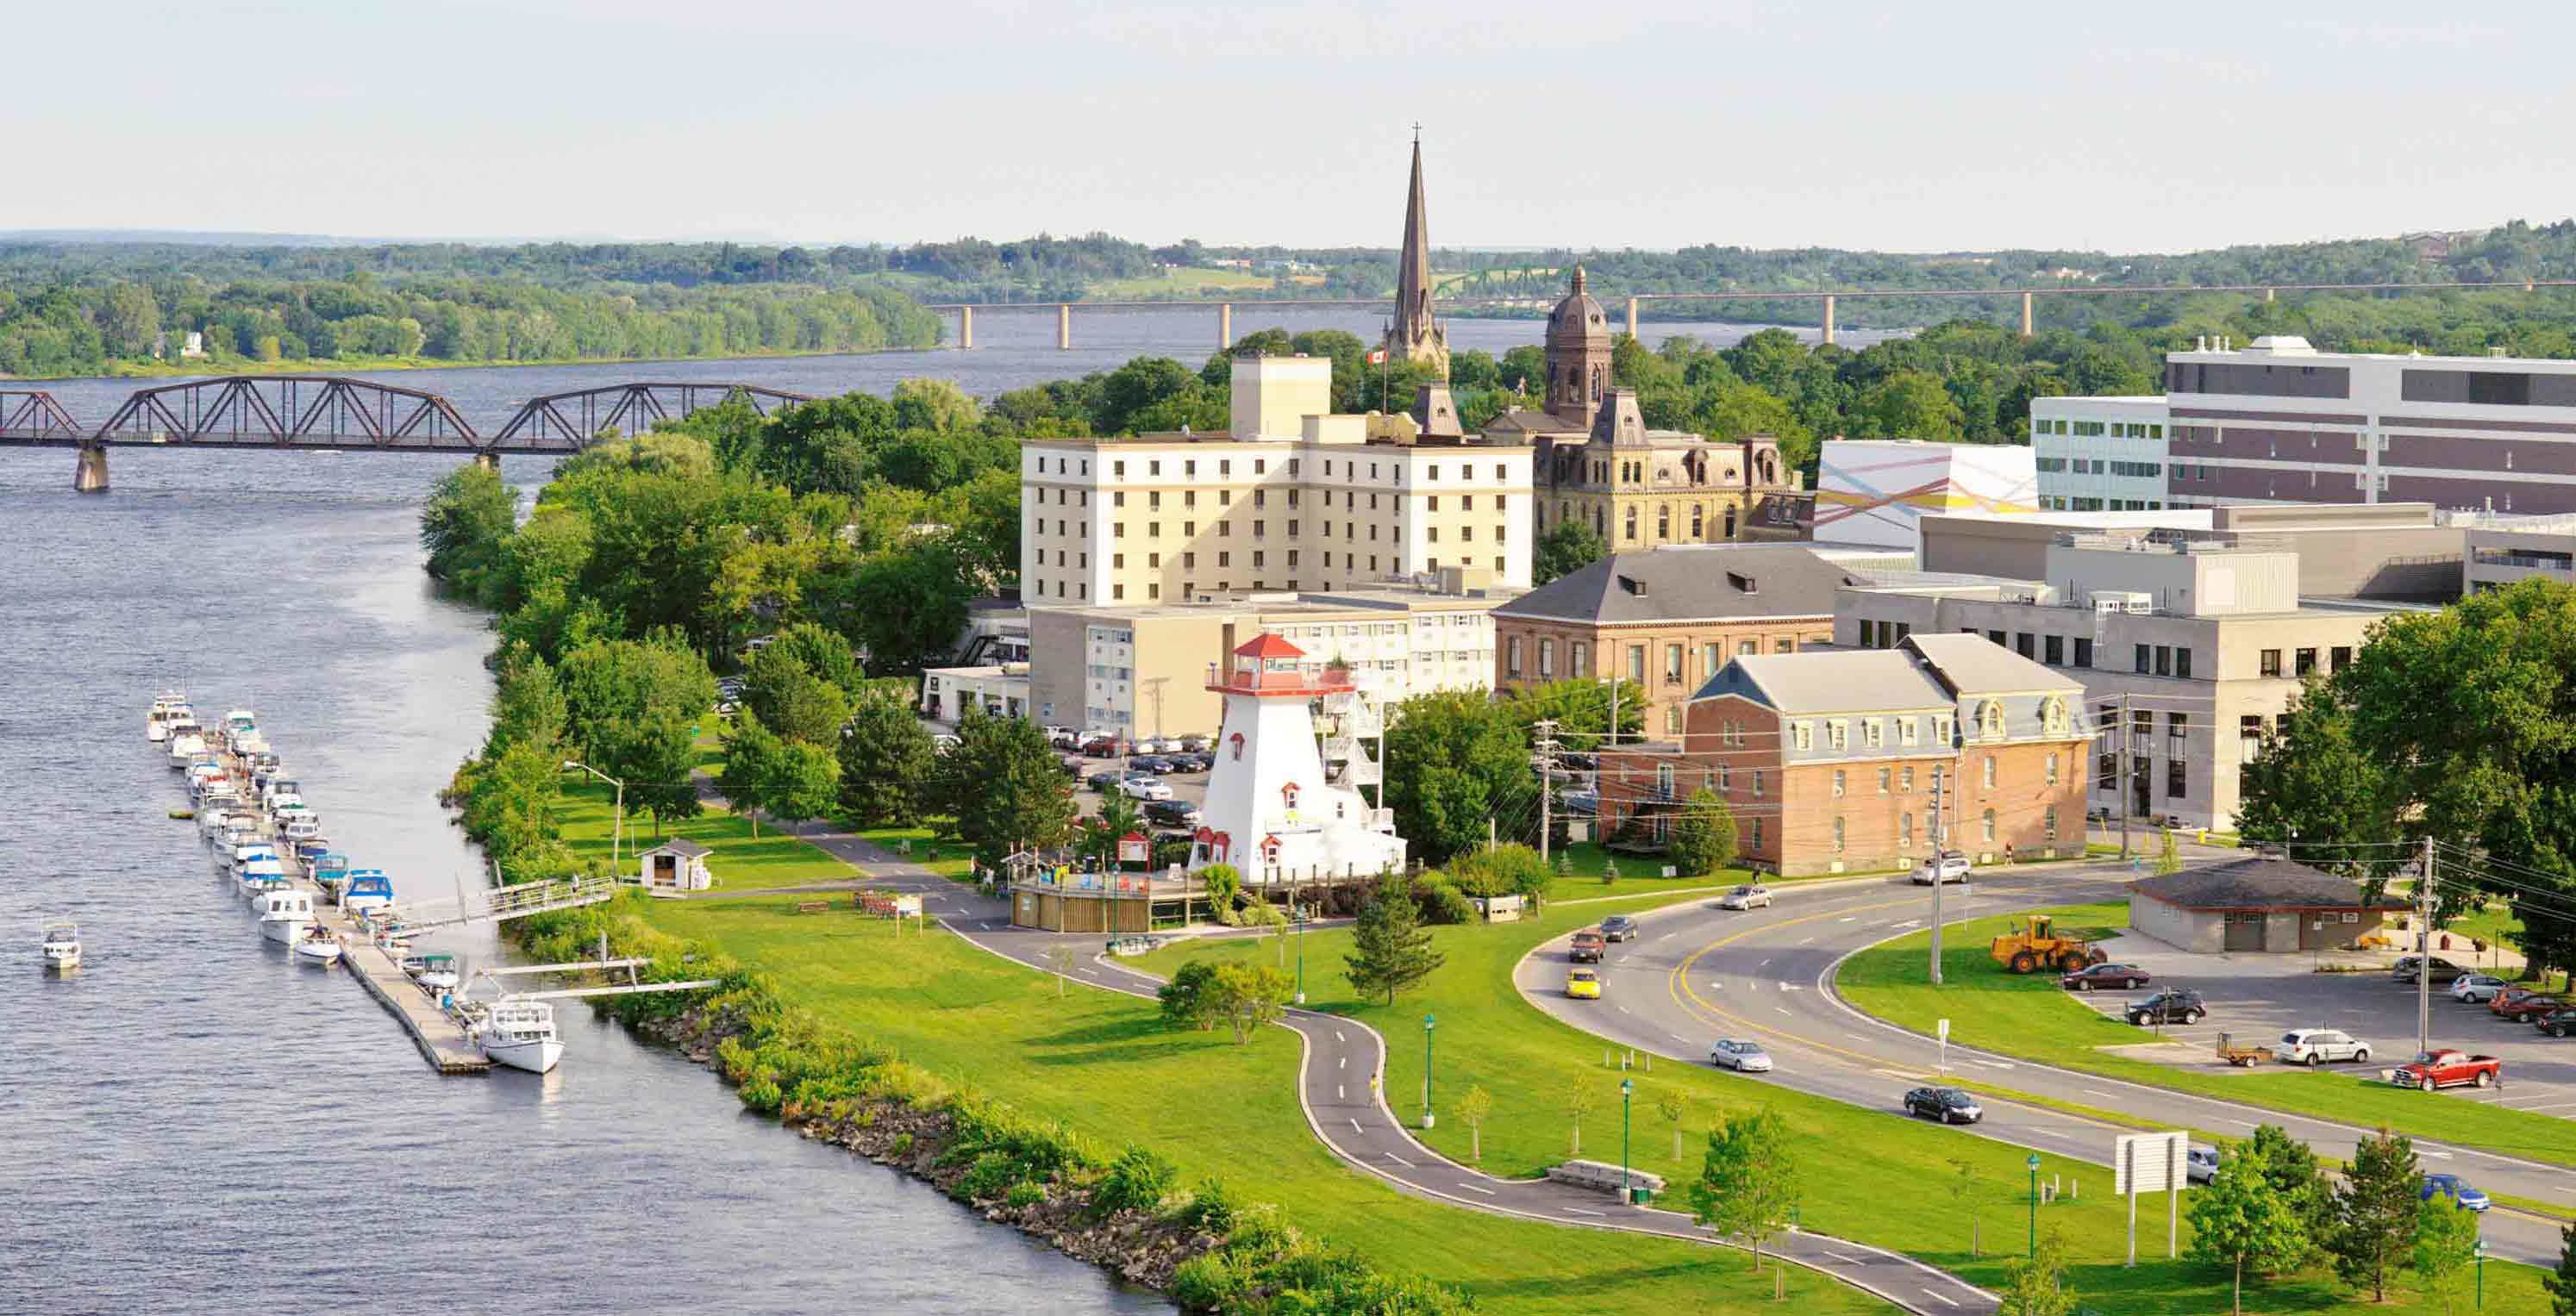 Fredericton, New Brunswick